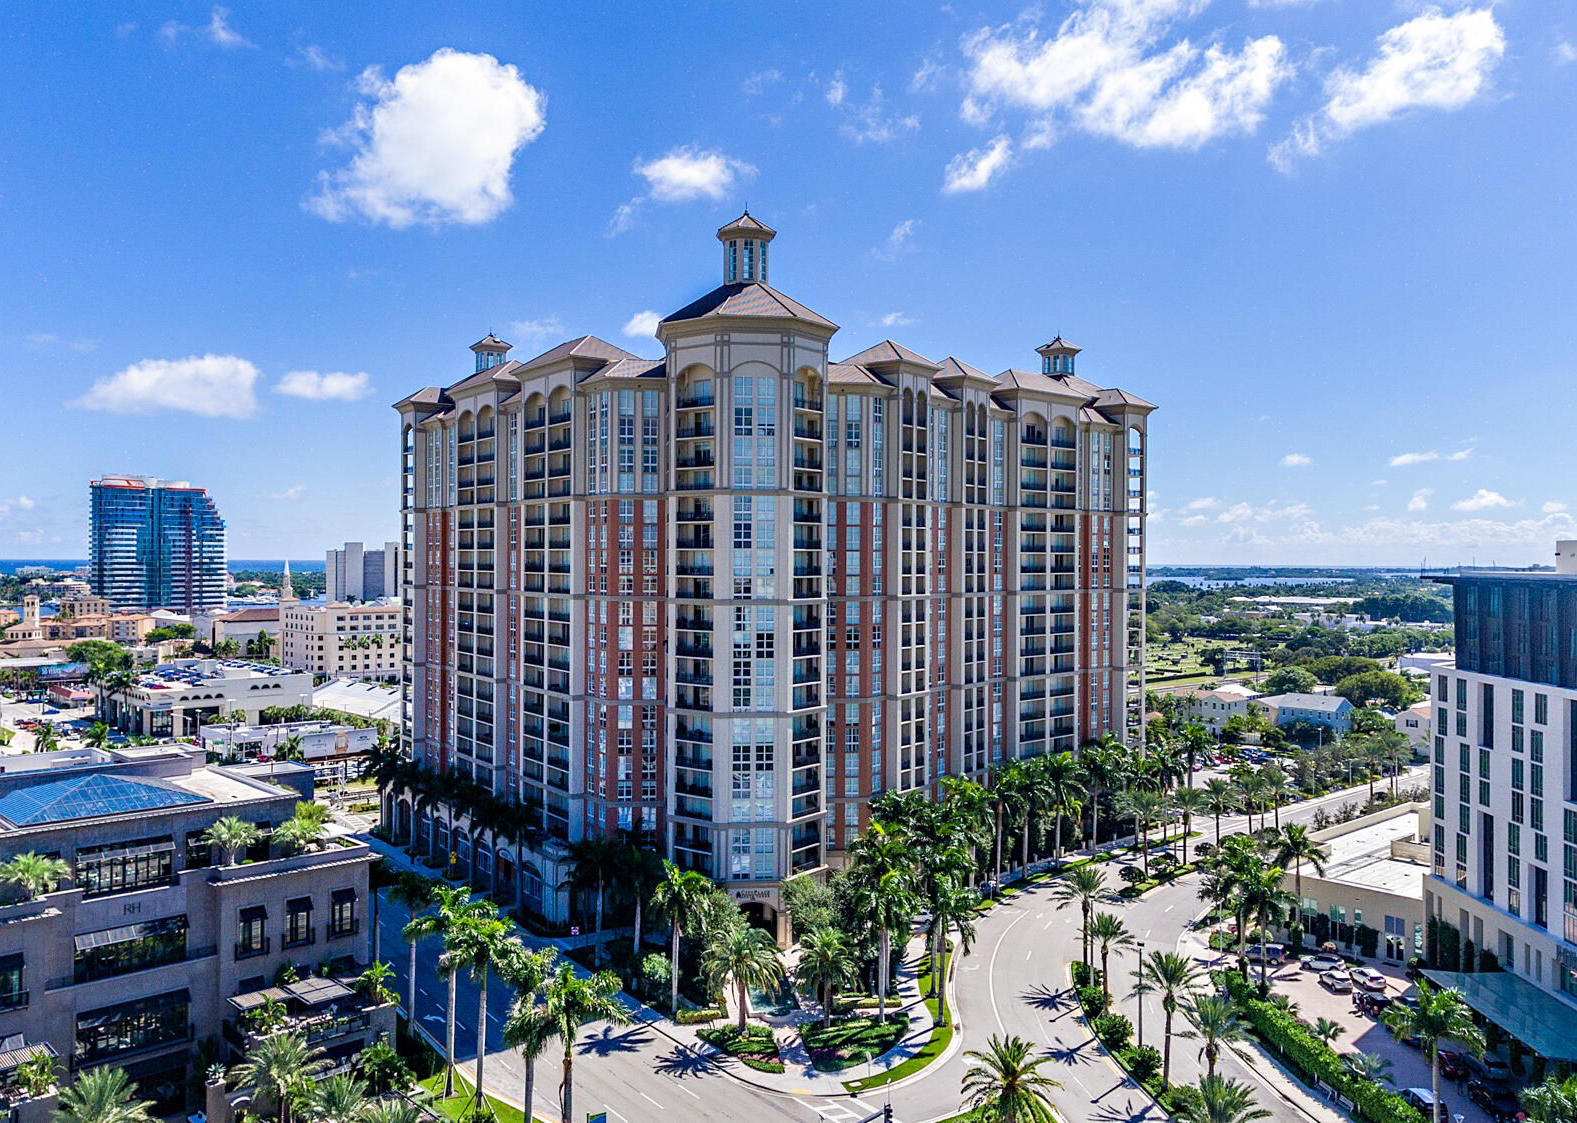 550 Okeechobee Boulevard Mph-21 West Palm Beach, FL 33401